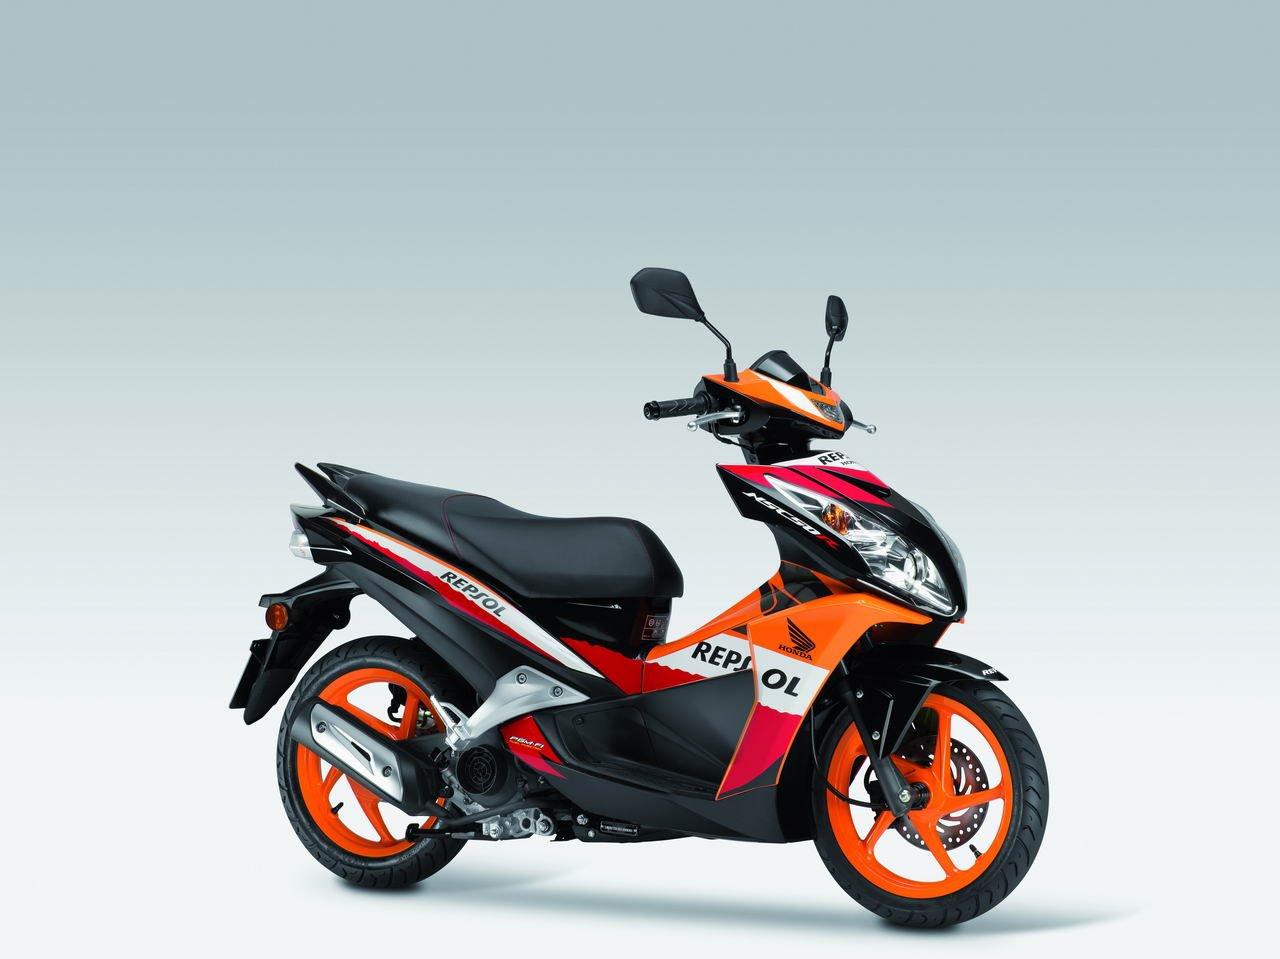 Listino Honda Integra 750 ABSS Scooter oltre 300 - image 14692_honda-nsc50r on http://moto.motori.net